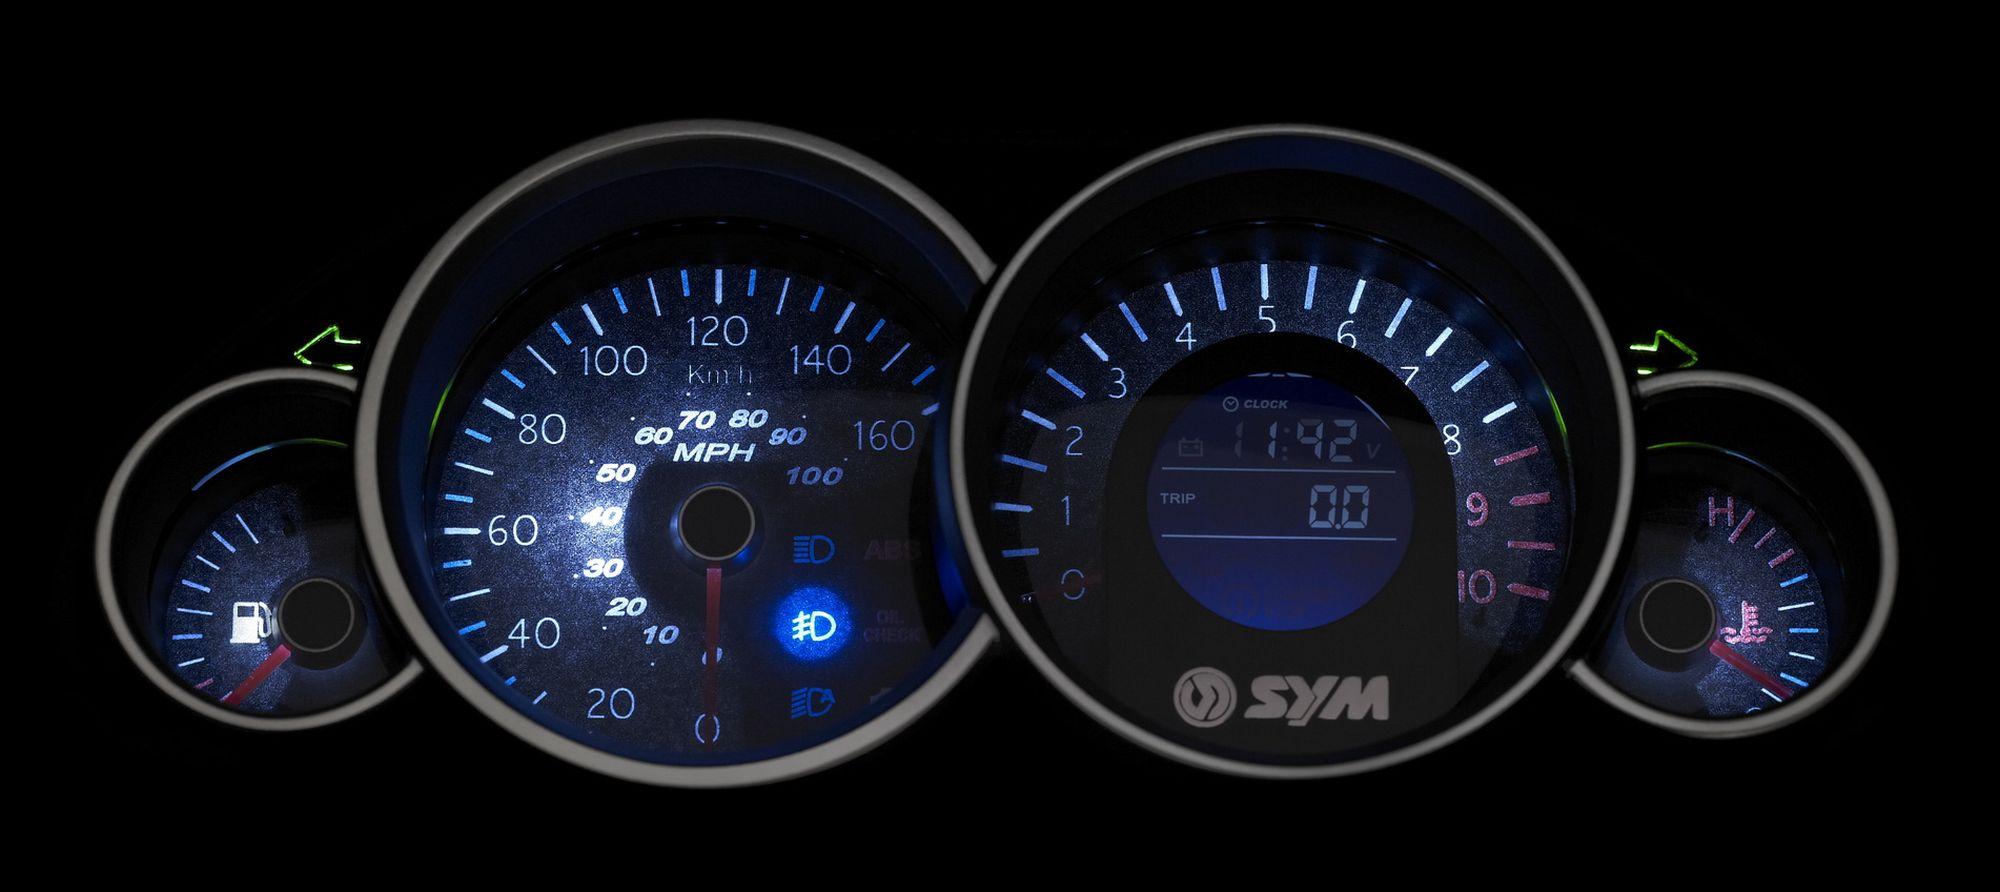 Sym GTS 125 Sport